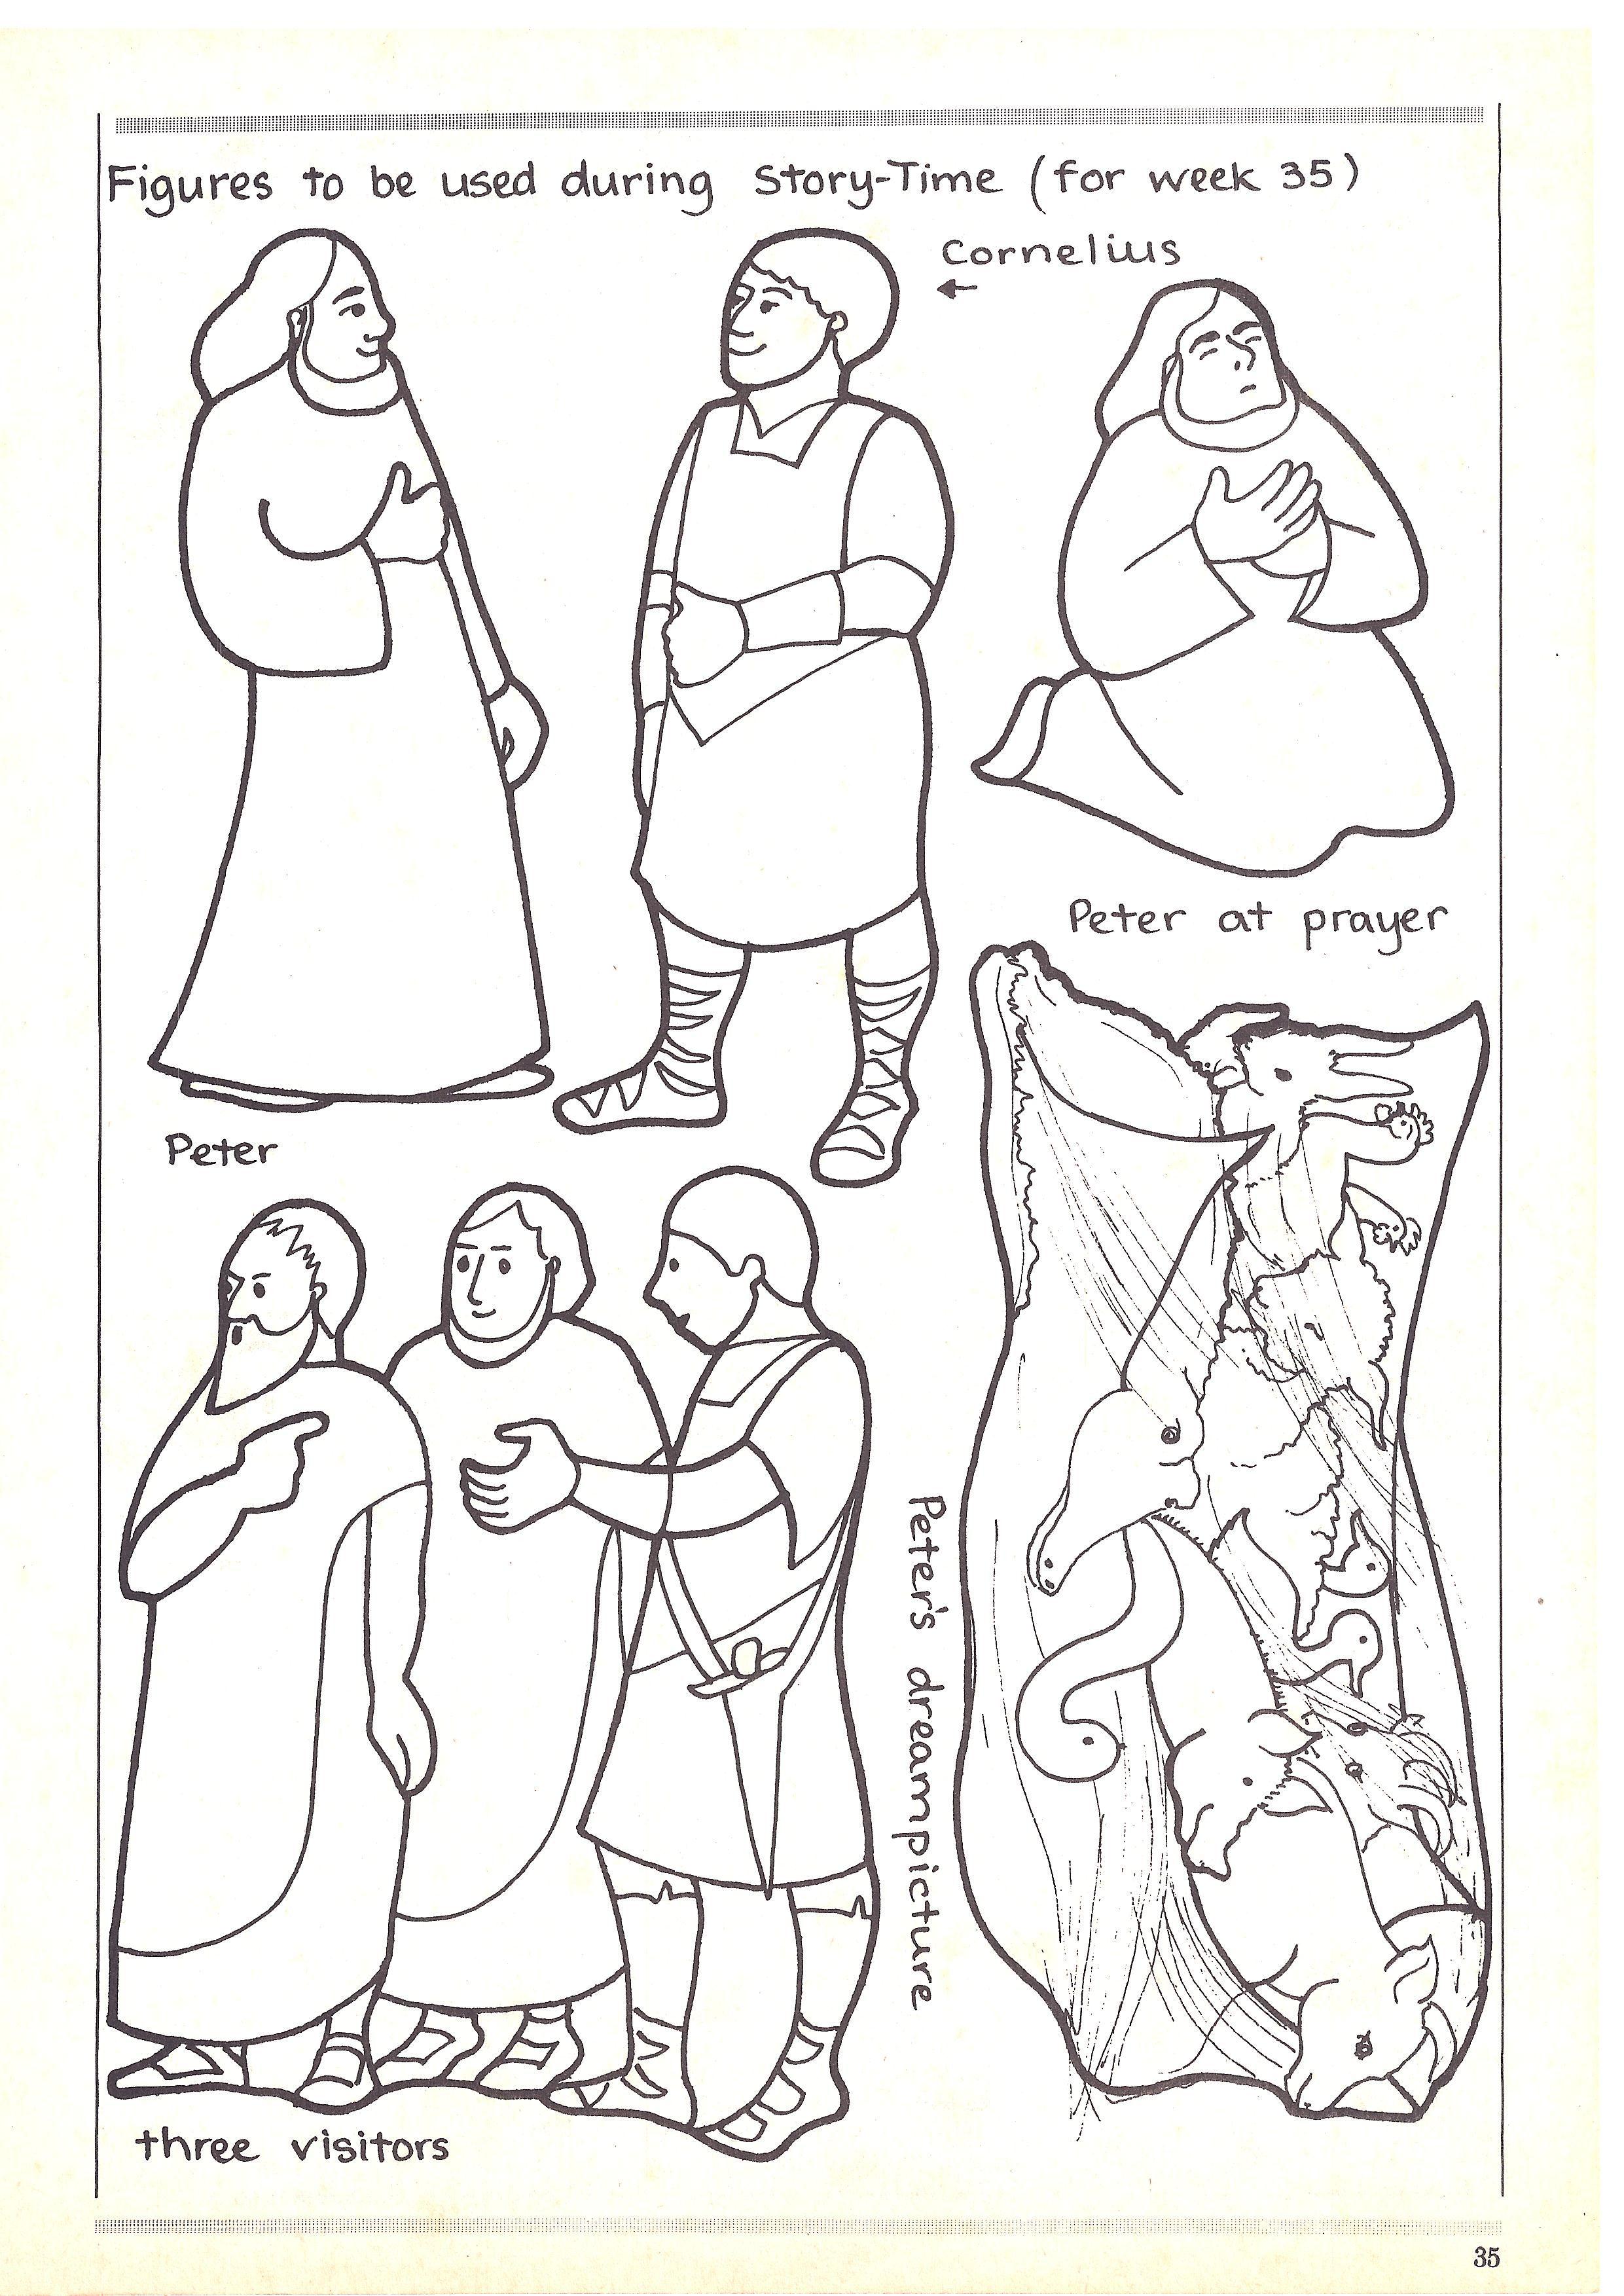 Peter and Cornelius Sunday School Lesson (Acts 10:1-22)